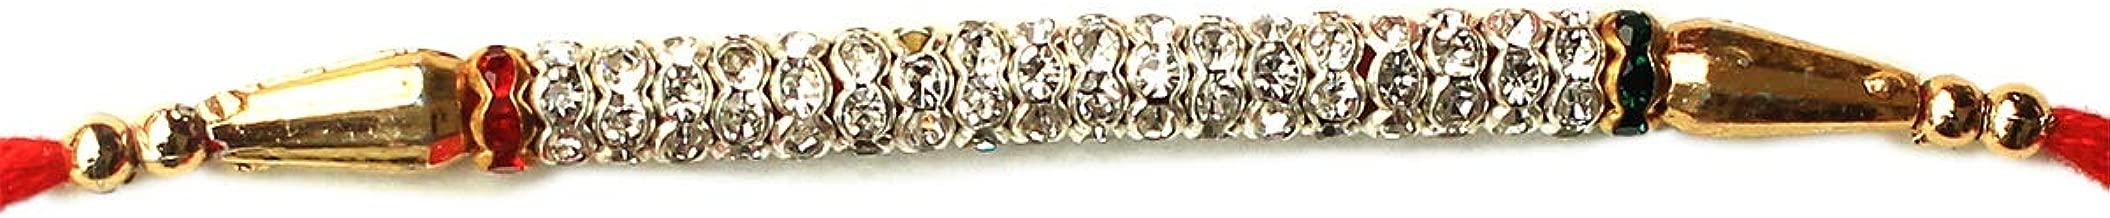 Rakhi for Brother - Bhabhi Bhaiya Raksha Bandhan Designer and Traditional Bracelet with Faux Diamond and Silver Glass Beads Thread/Band - Simple and Best Rakhi